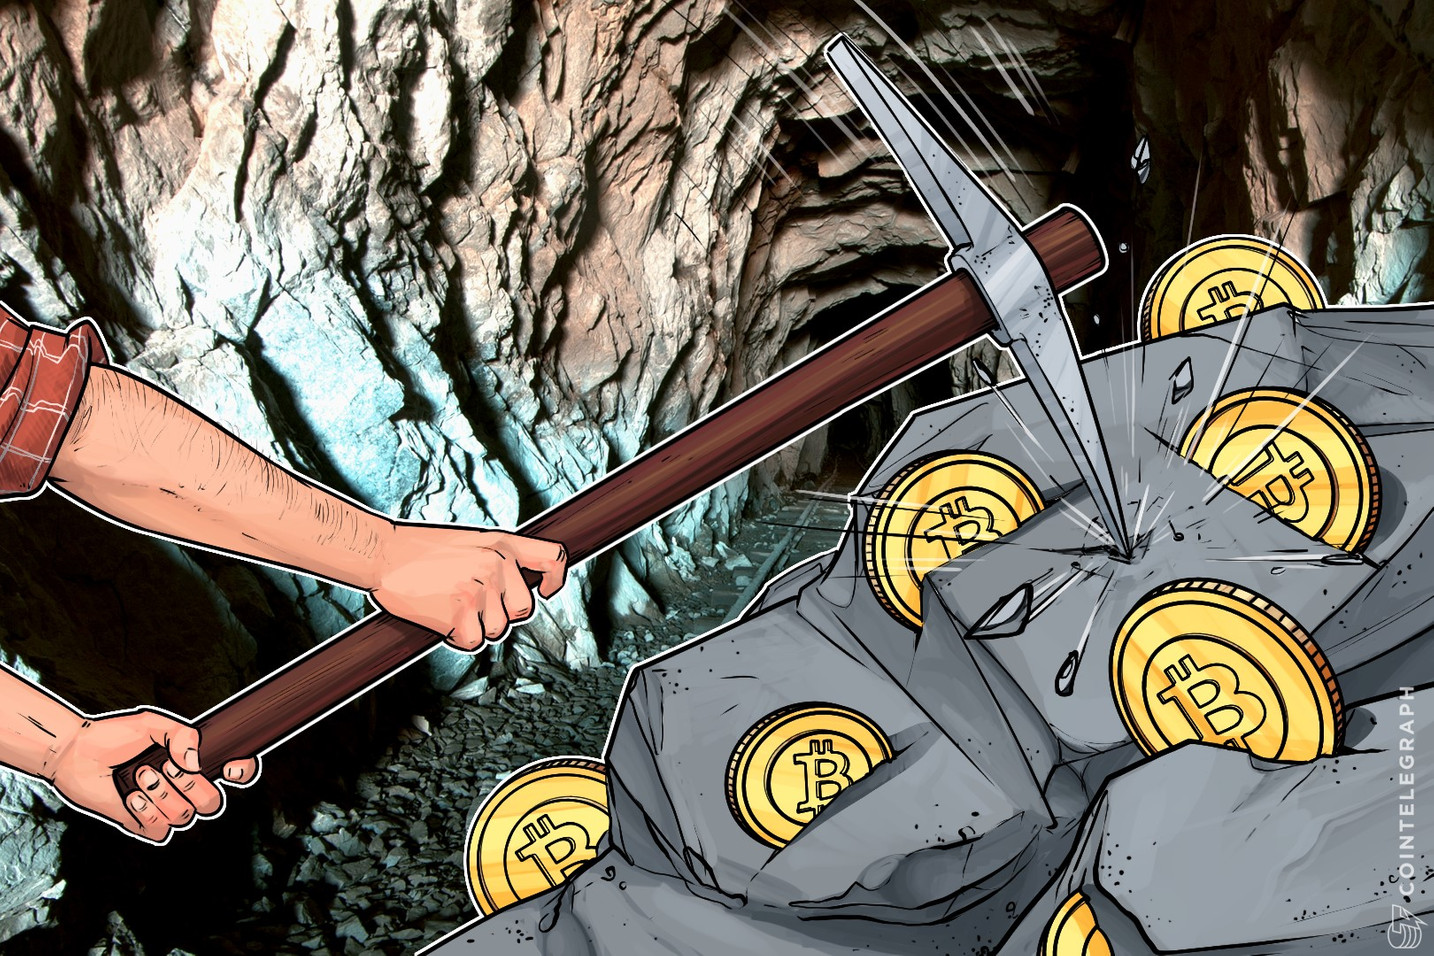 'Halving do Bitcoin já está precificado pelos mineradores' diz analista fundador da Morgan Creek